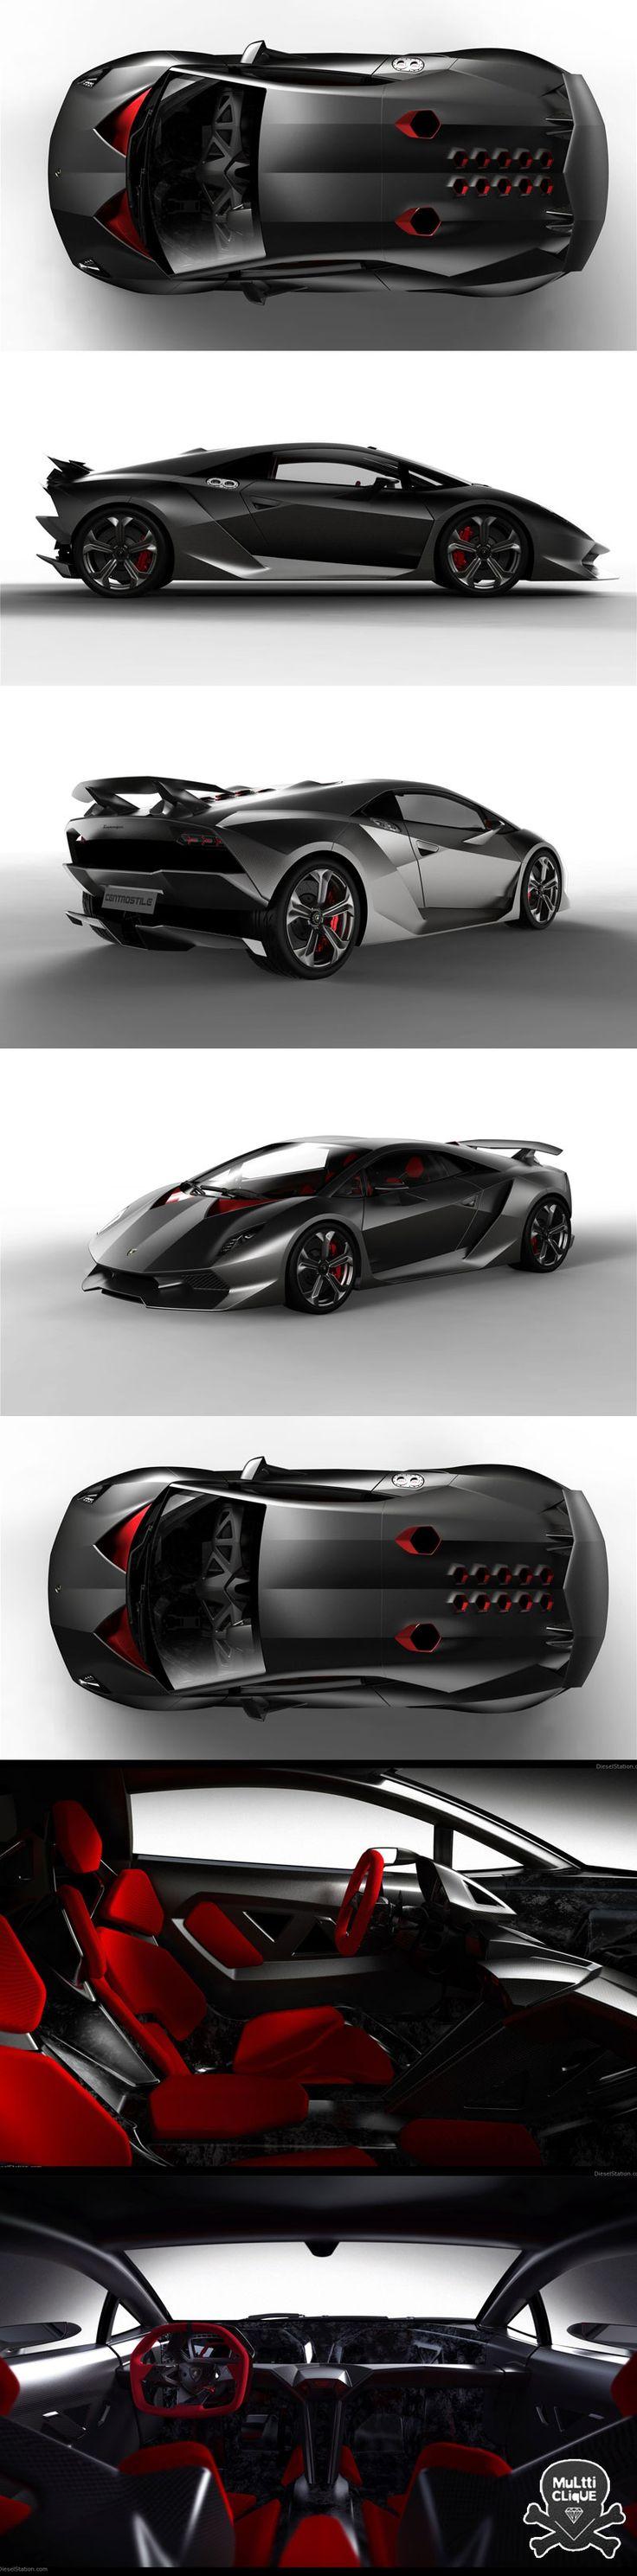 Lamborghini Sesto Elemento, Sixth Element = Carbon